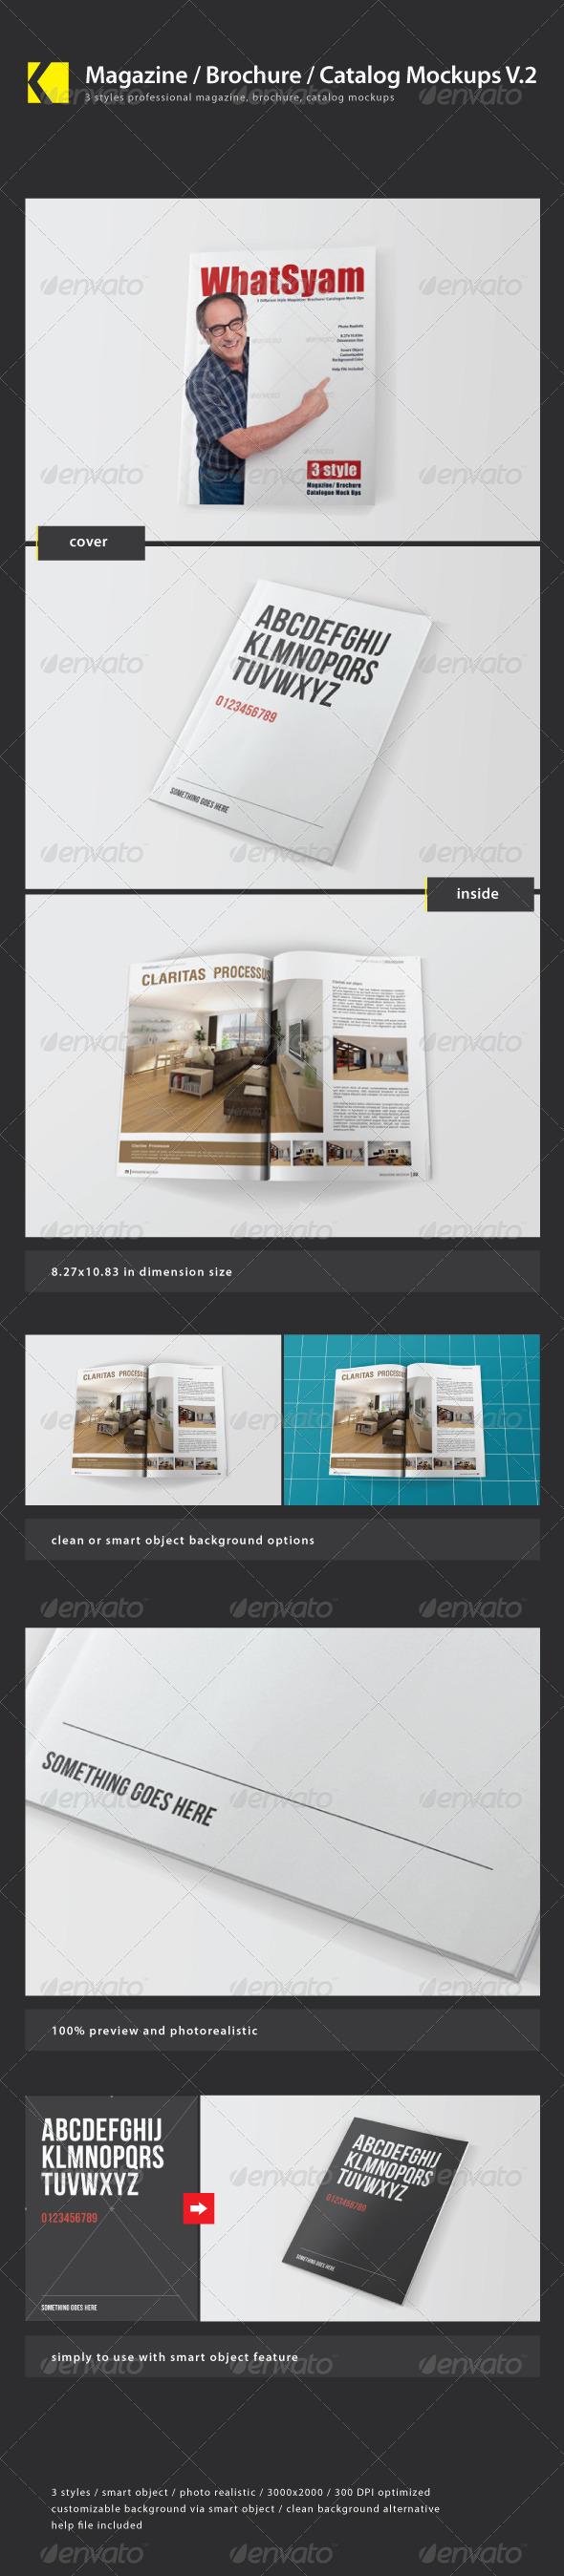 GraphicRiver Magazine Brochure Catalog Mockups V.2 4169608